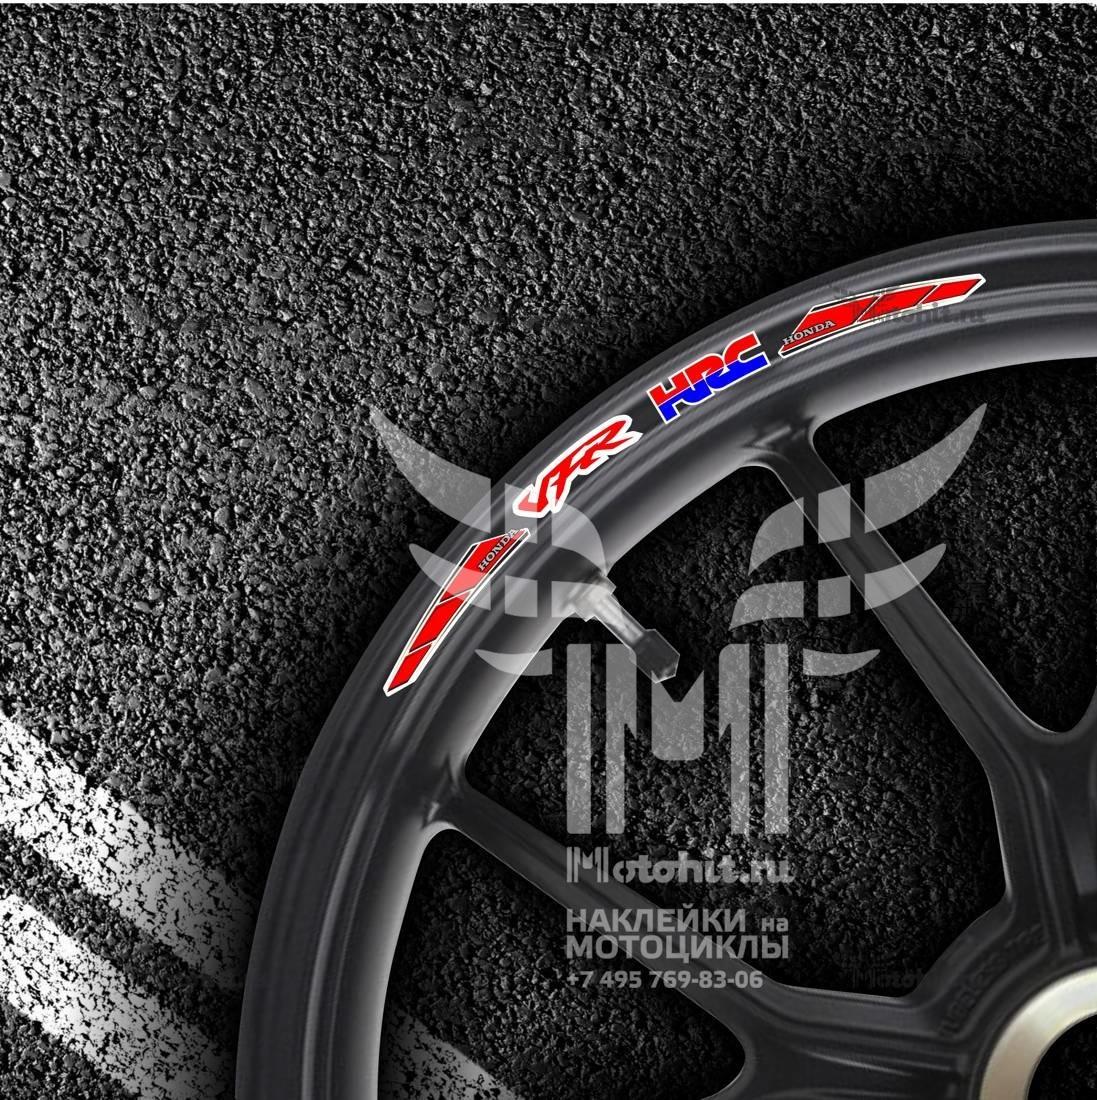 Комплект наклеек на обод колеса мотоцикла HONDA VFR-HRC